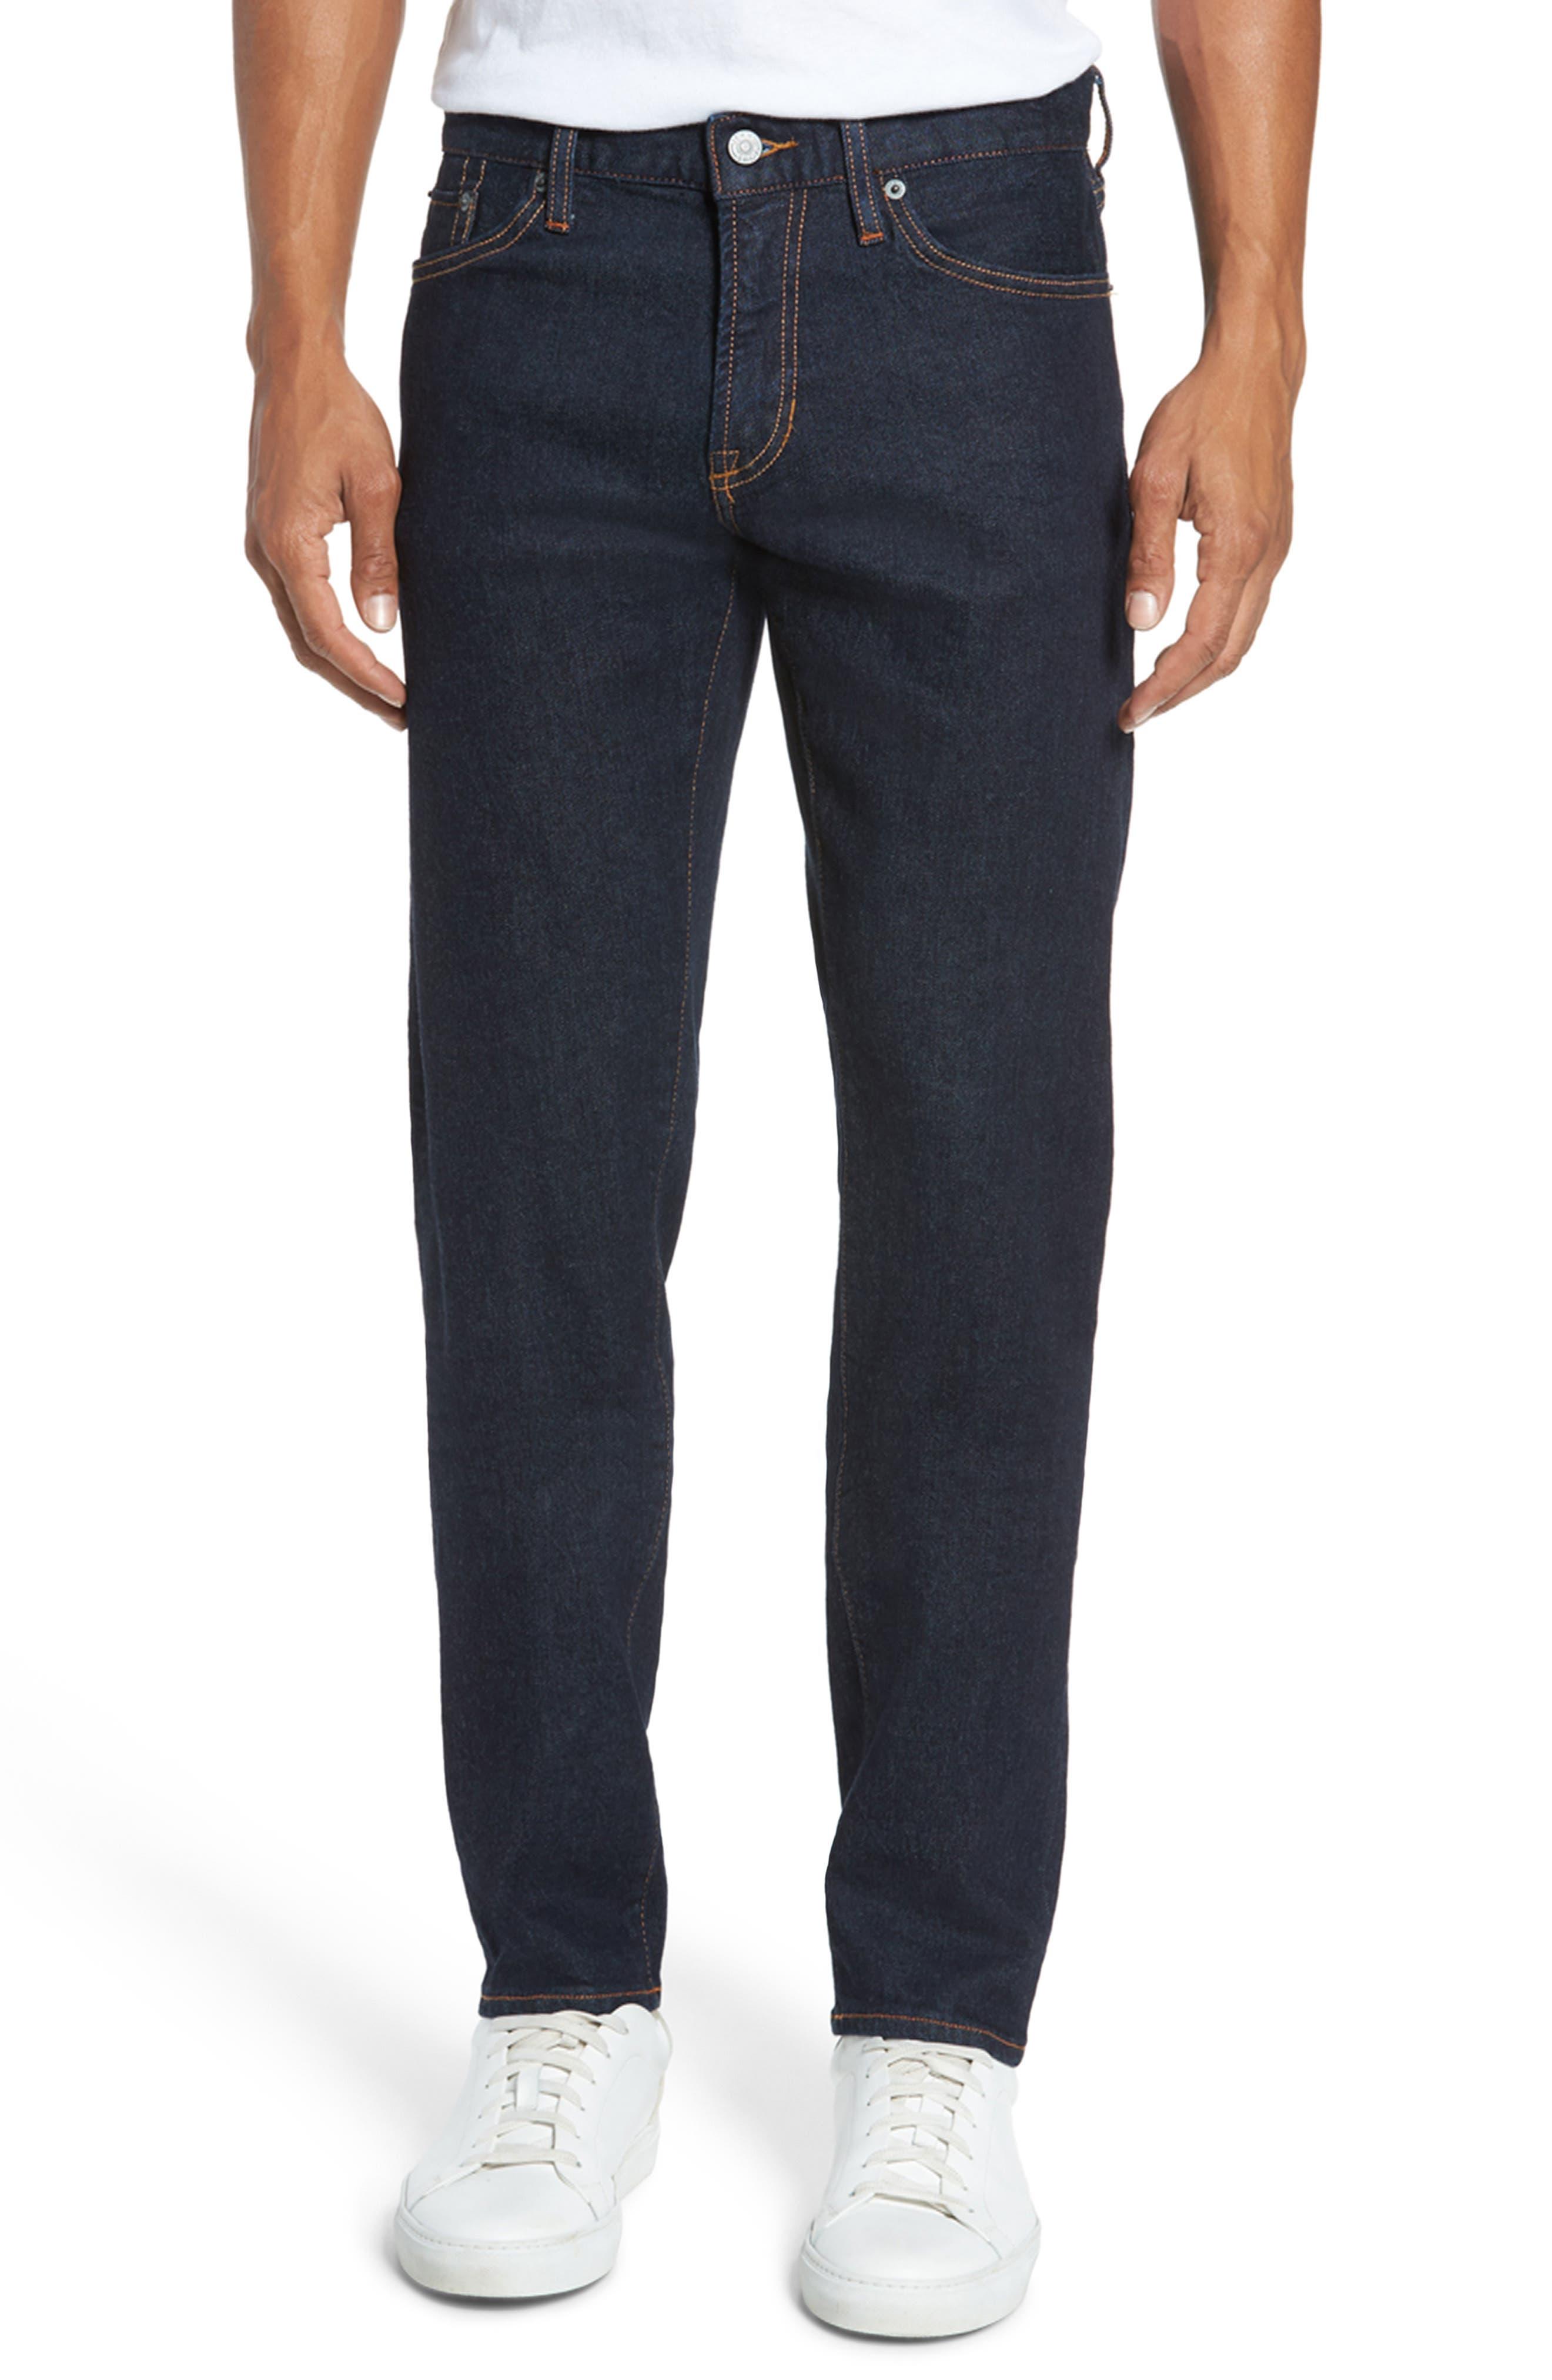 Jim Slim Fit Selvedge Jeans,                             Main thumbnail 1, color,                             460